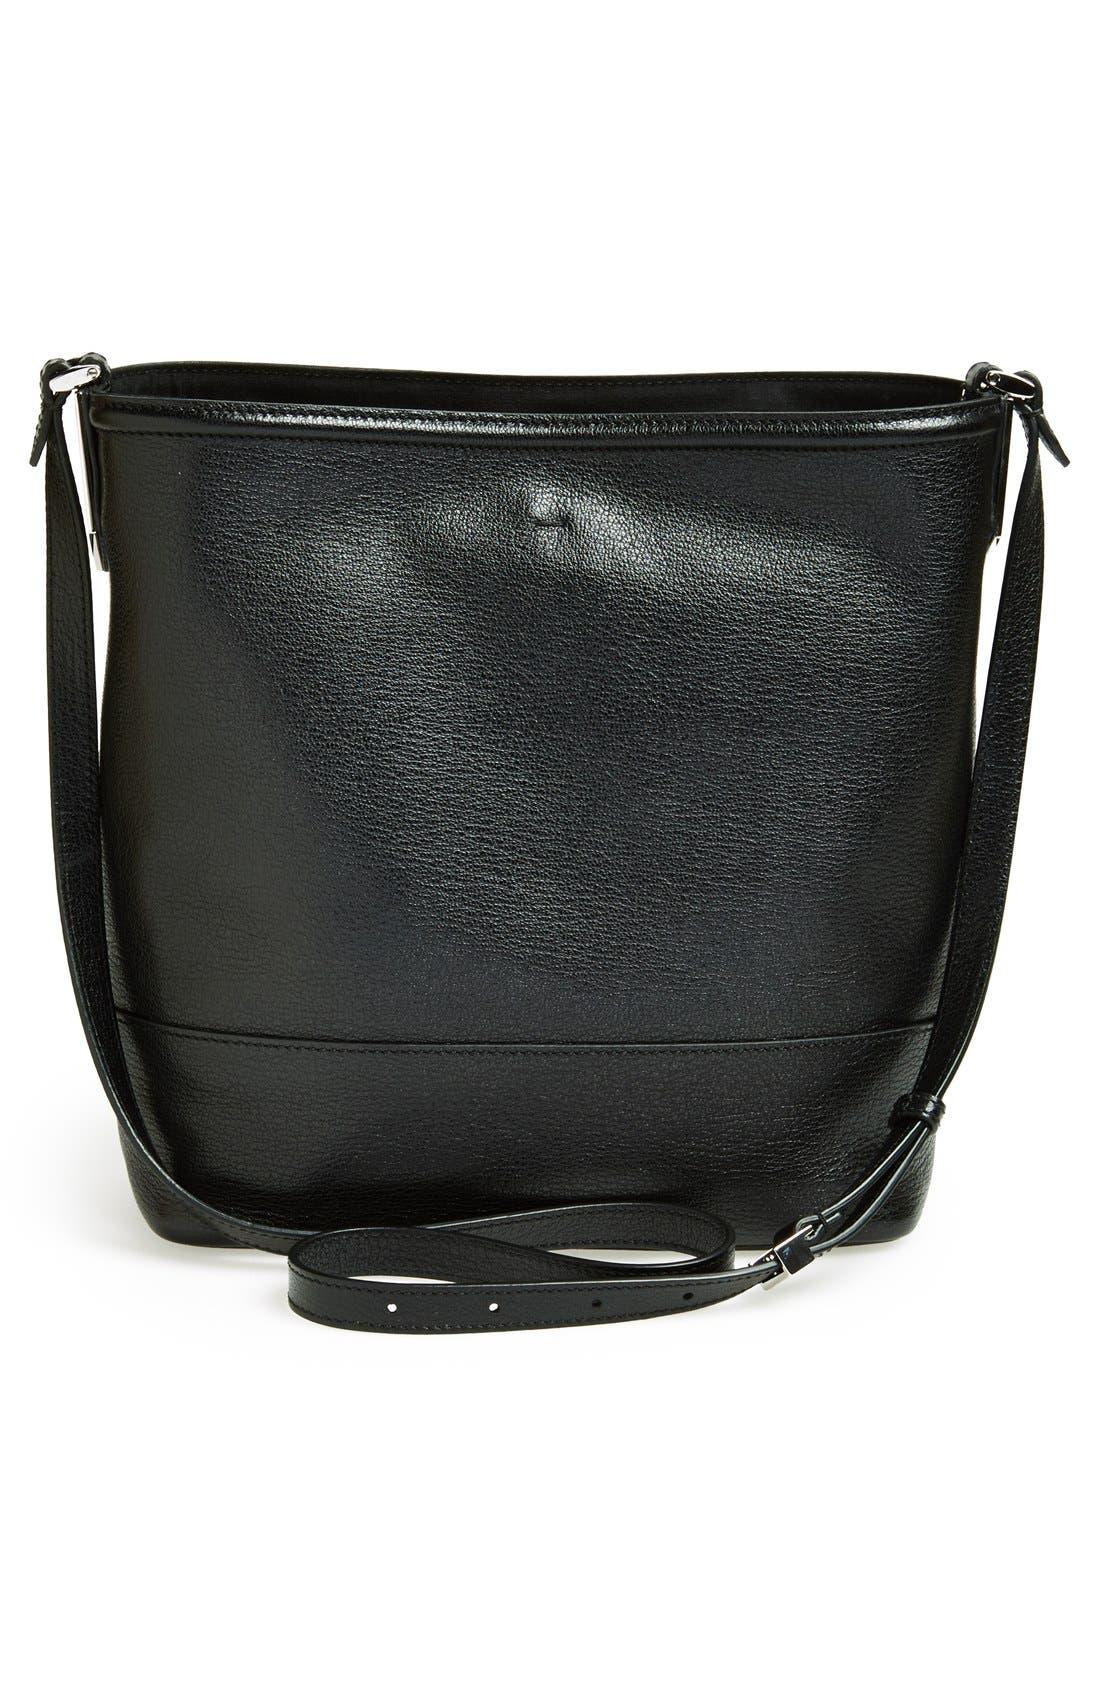 Leather Bucket Crossbody Bag,                             Alternate thumbnail 3, color,                             Black/ Palladium